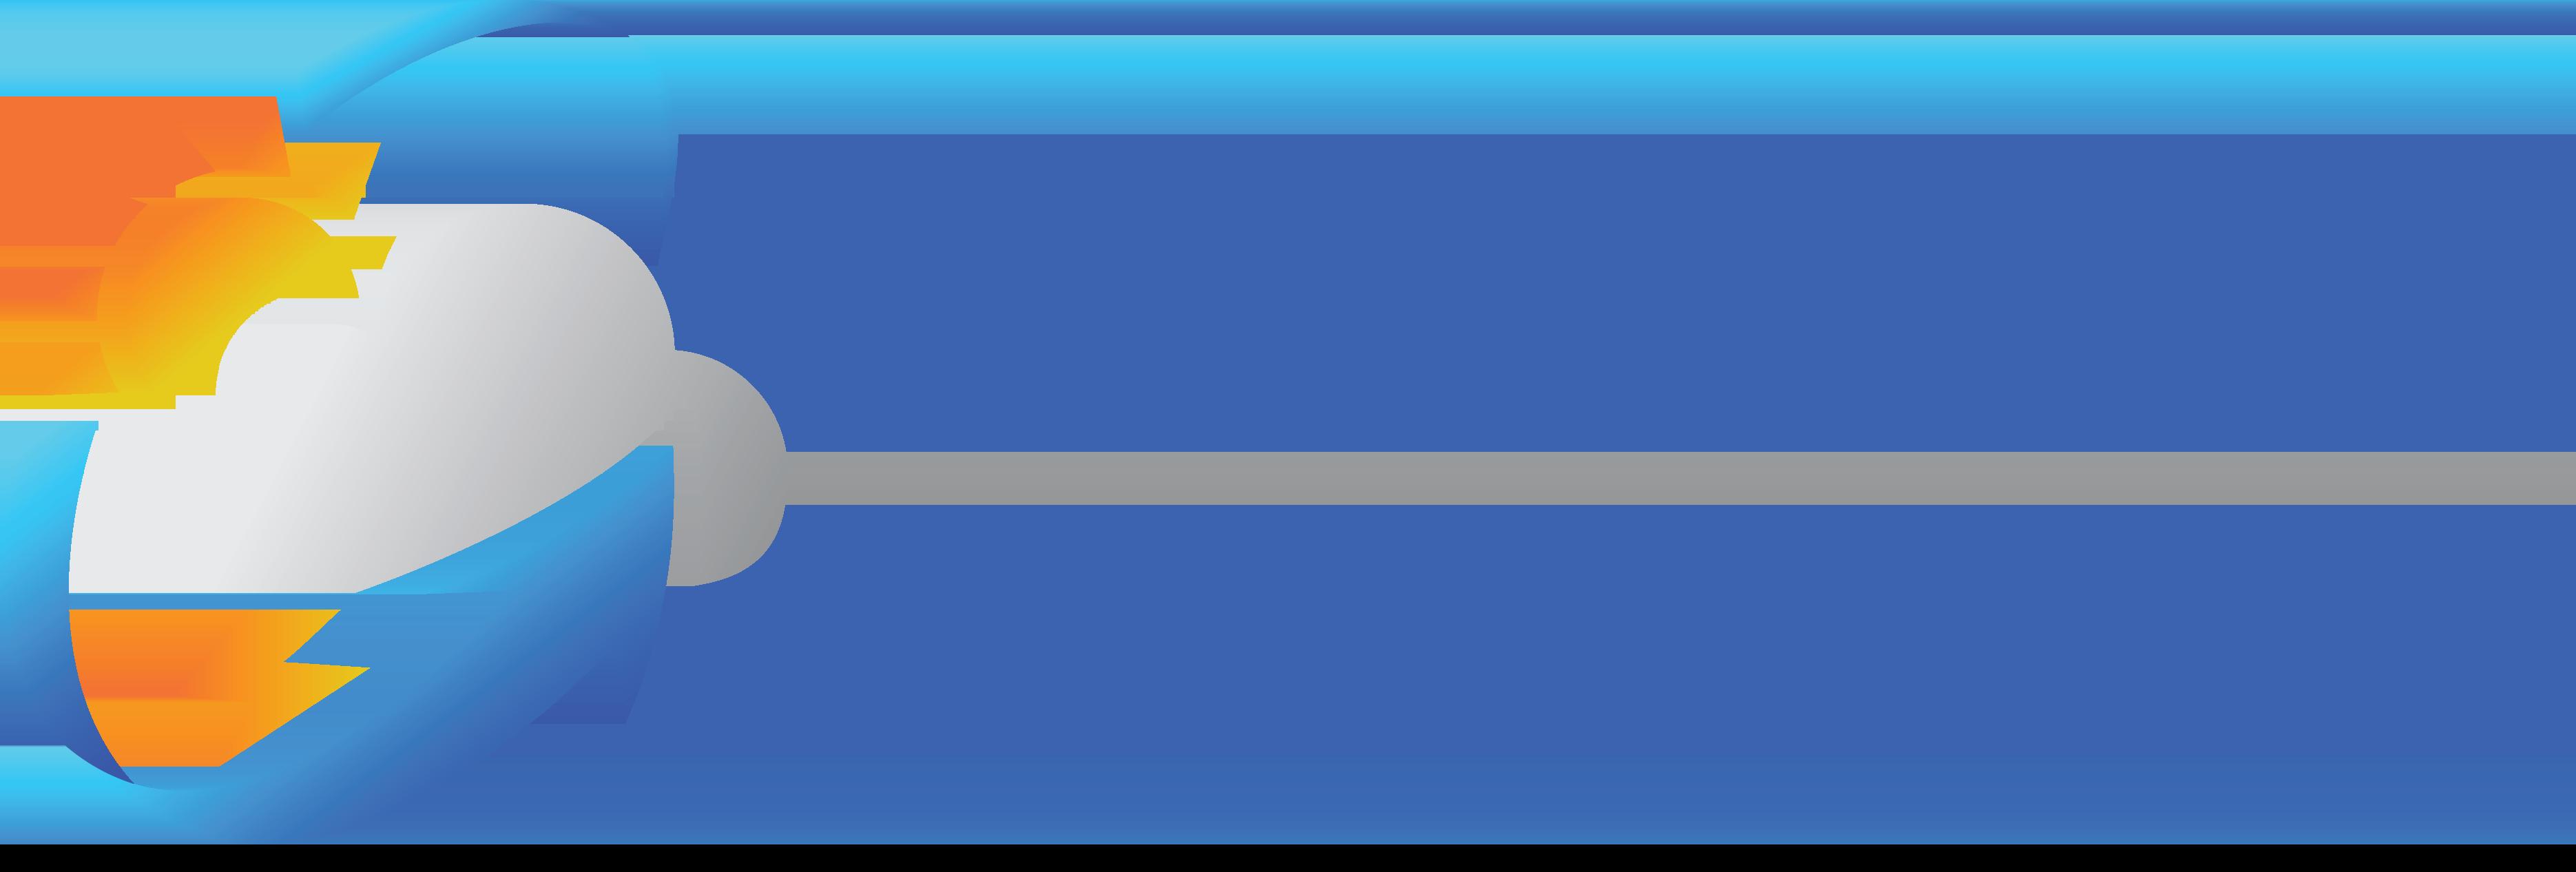 WDSS International